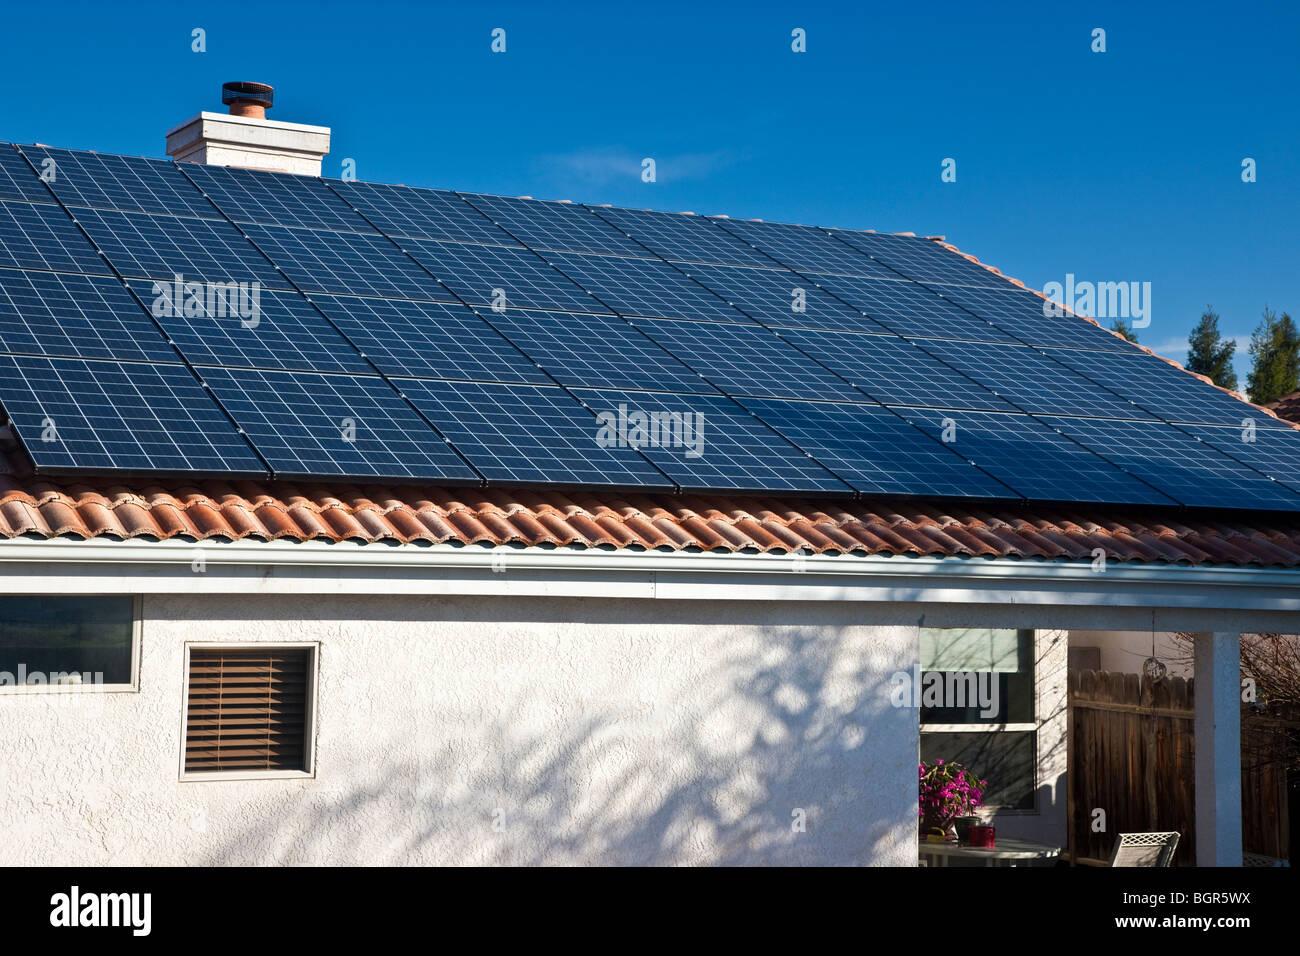 Solar Electric pannelli, residence tetto. Immagini Stock